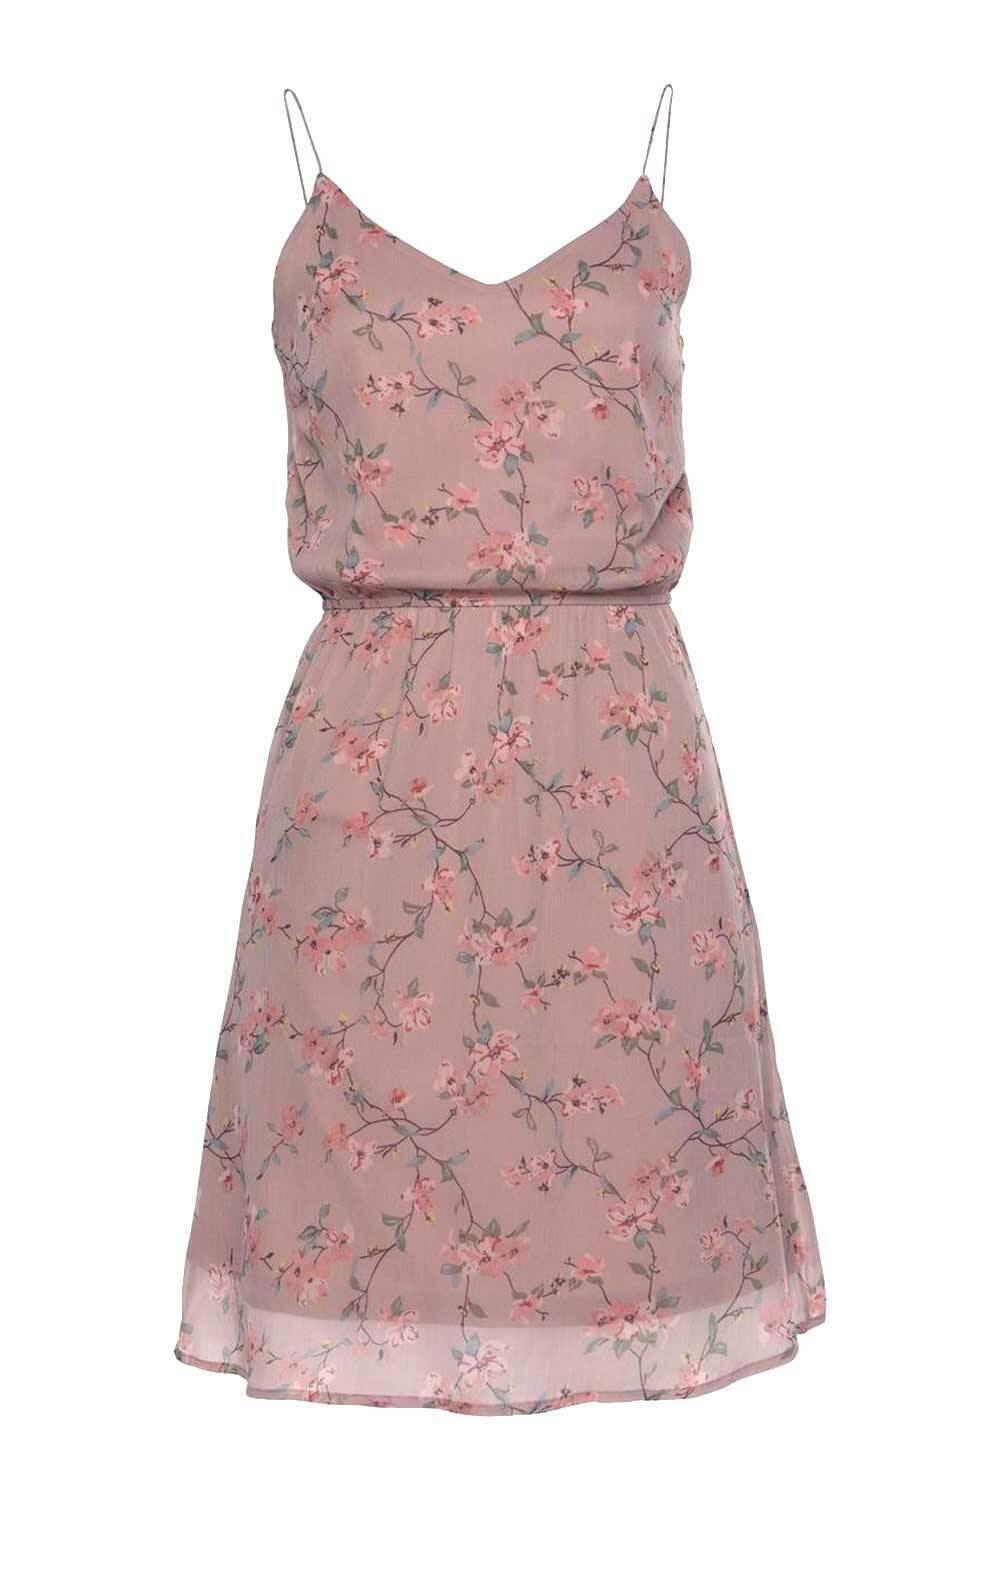 Kleid VERO MODA rosa kurz ausgestellt geblümt Gr M L